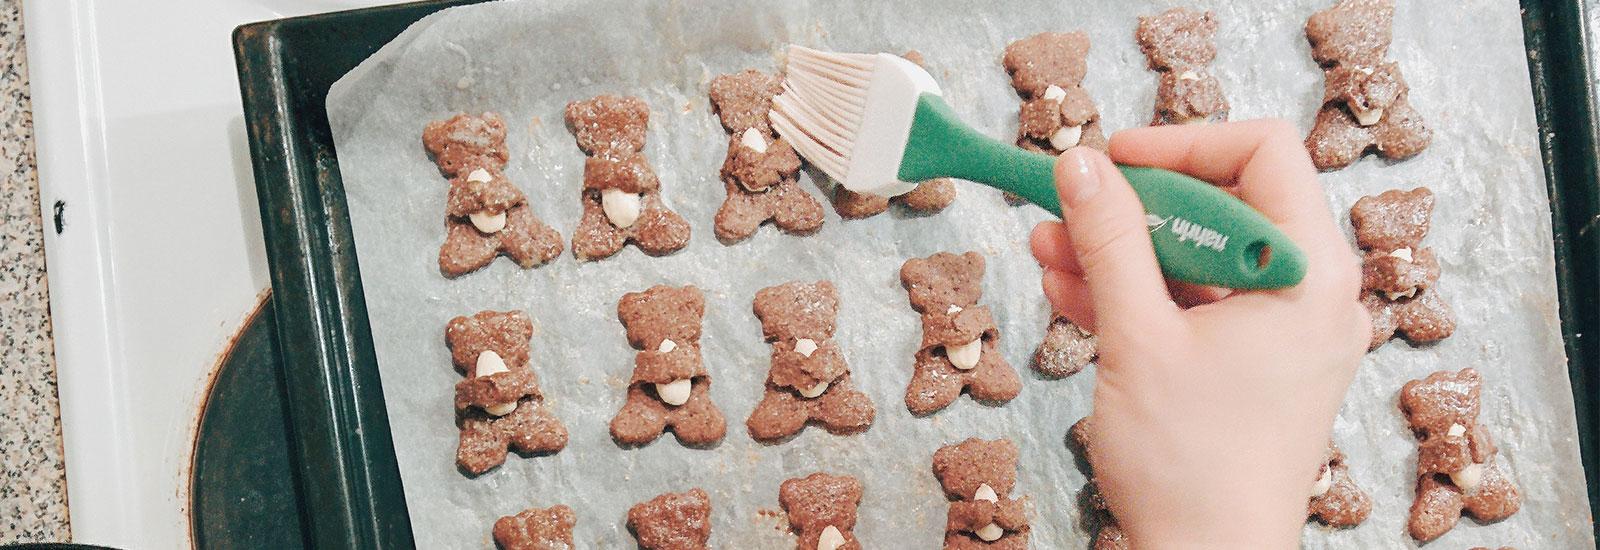 Klasyczne kruche ciasteczka